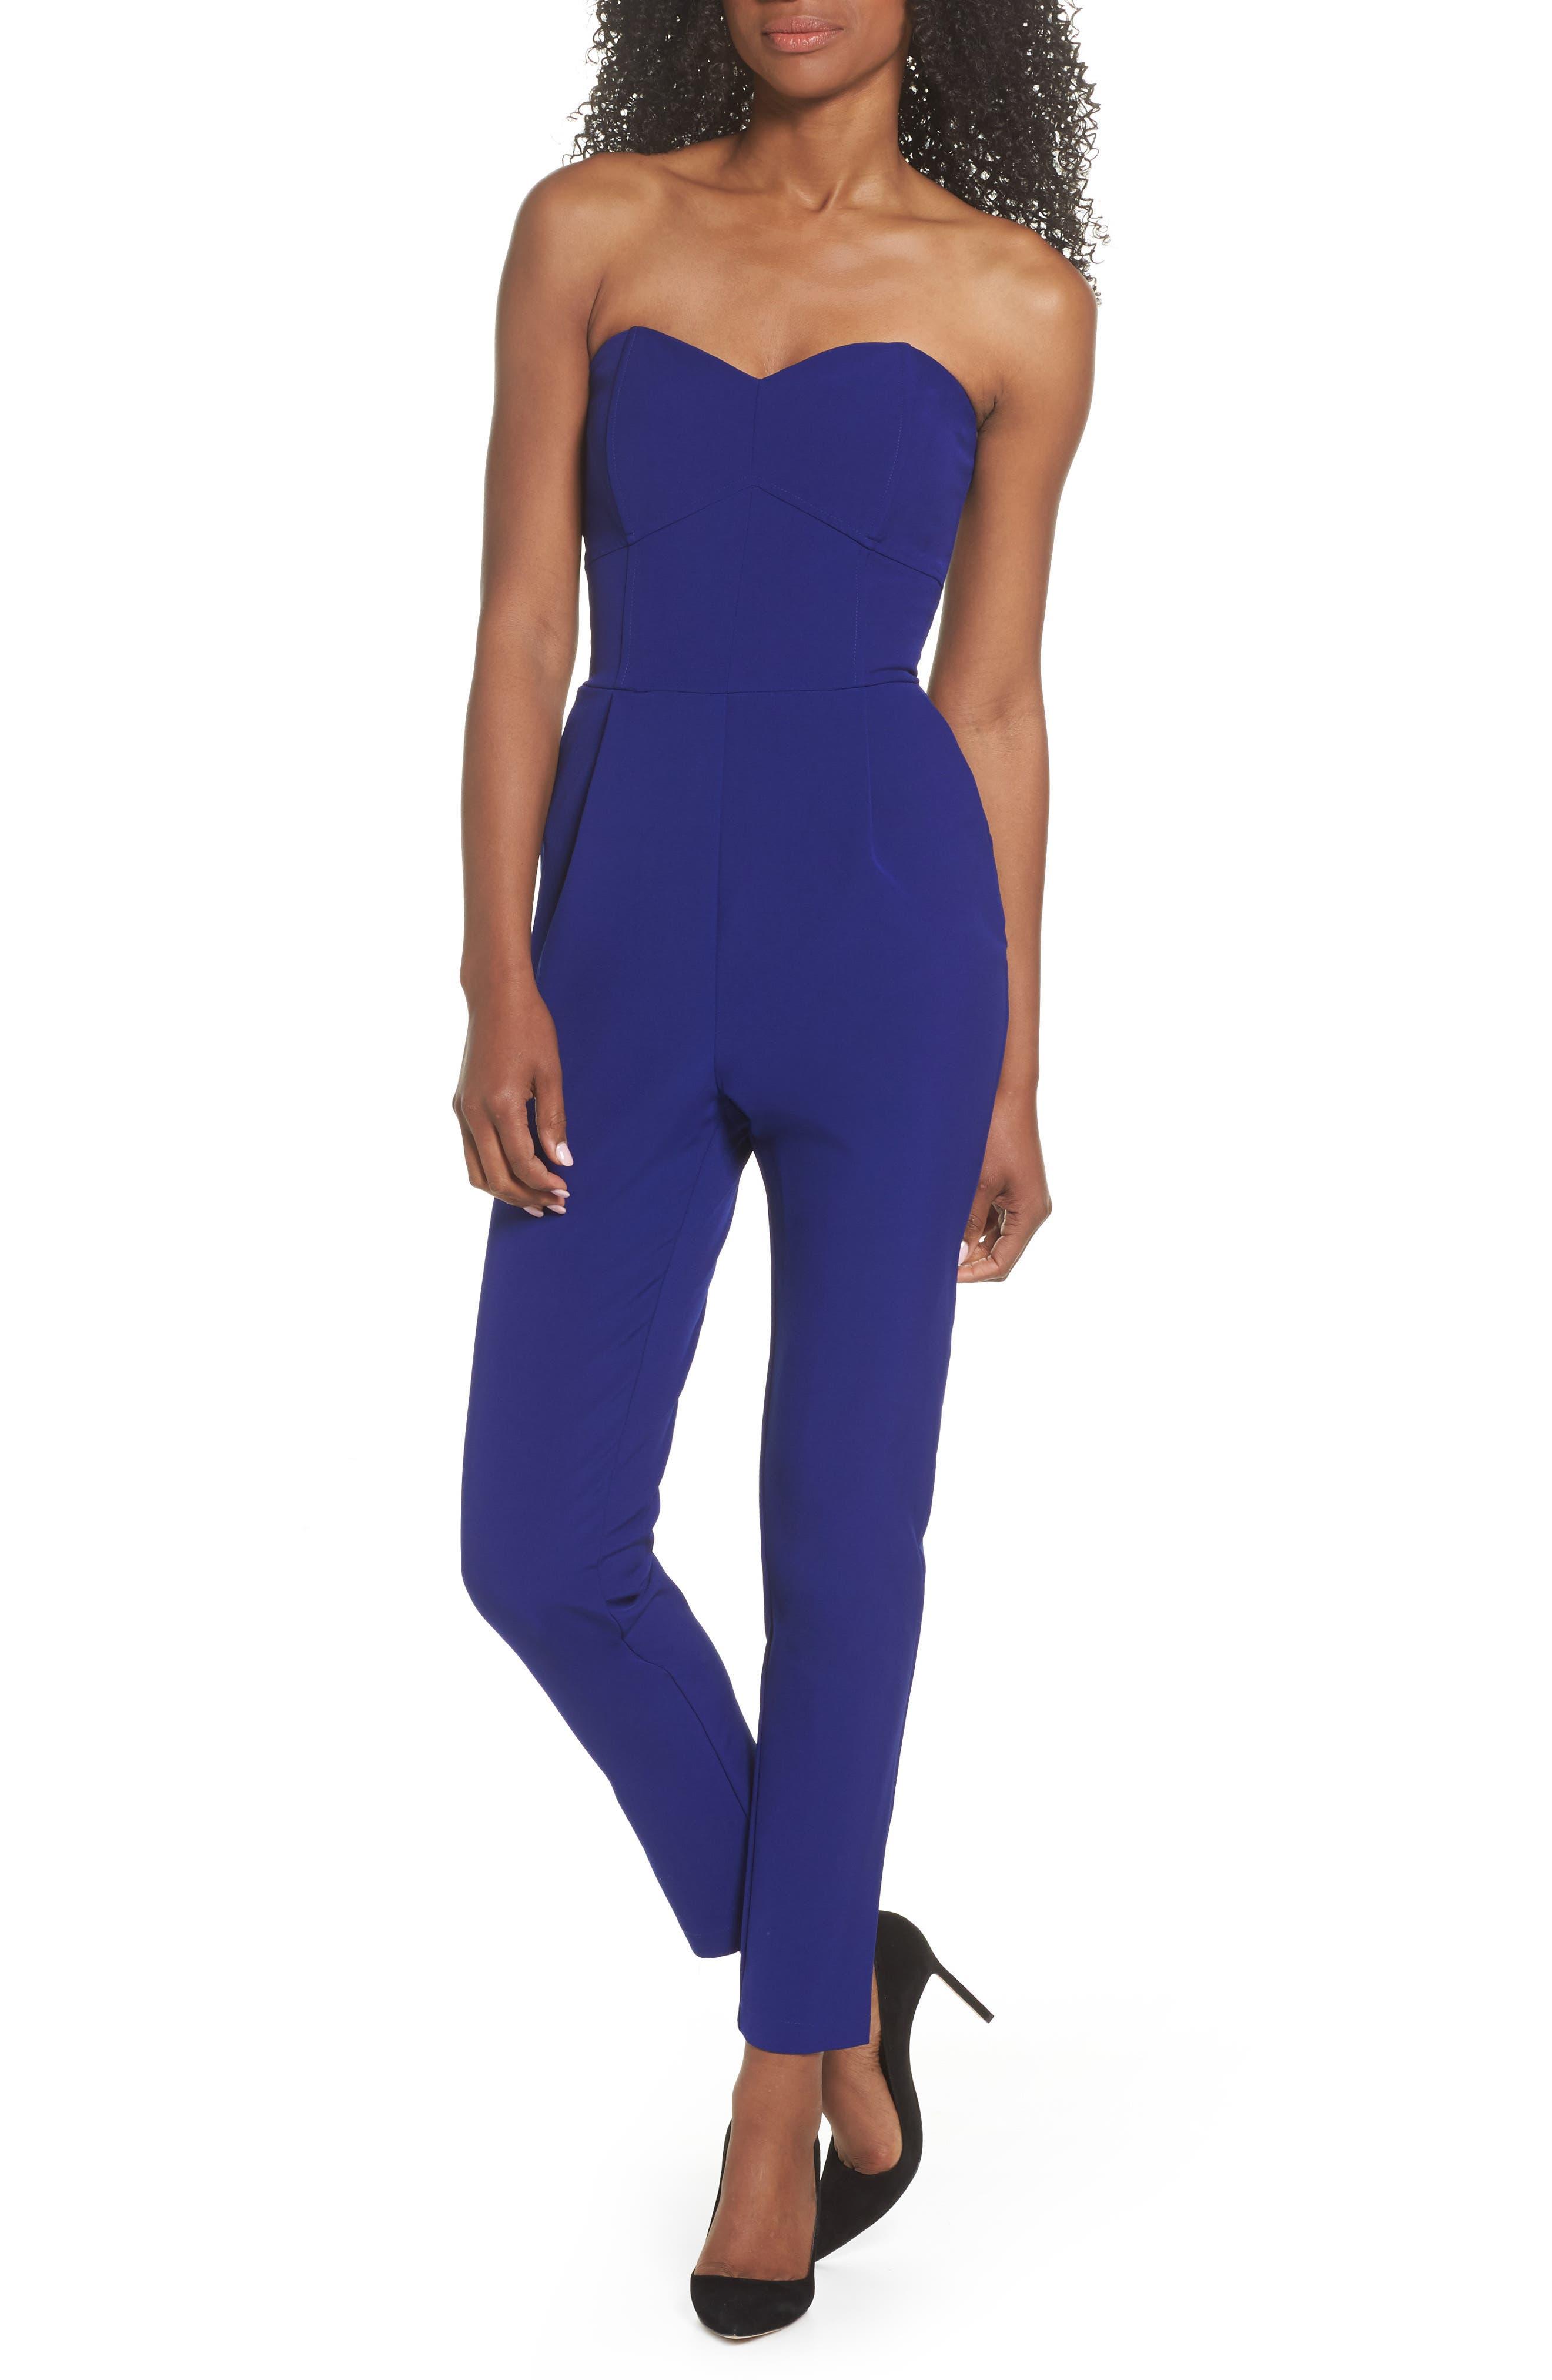 Light Blue Strapless Jumpsuit